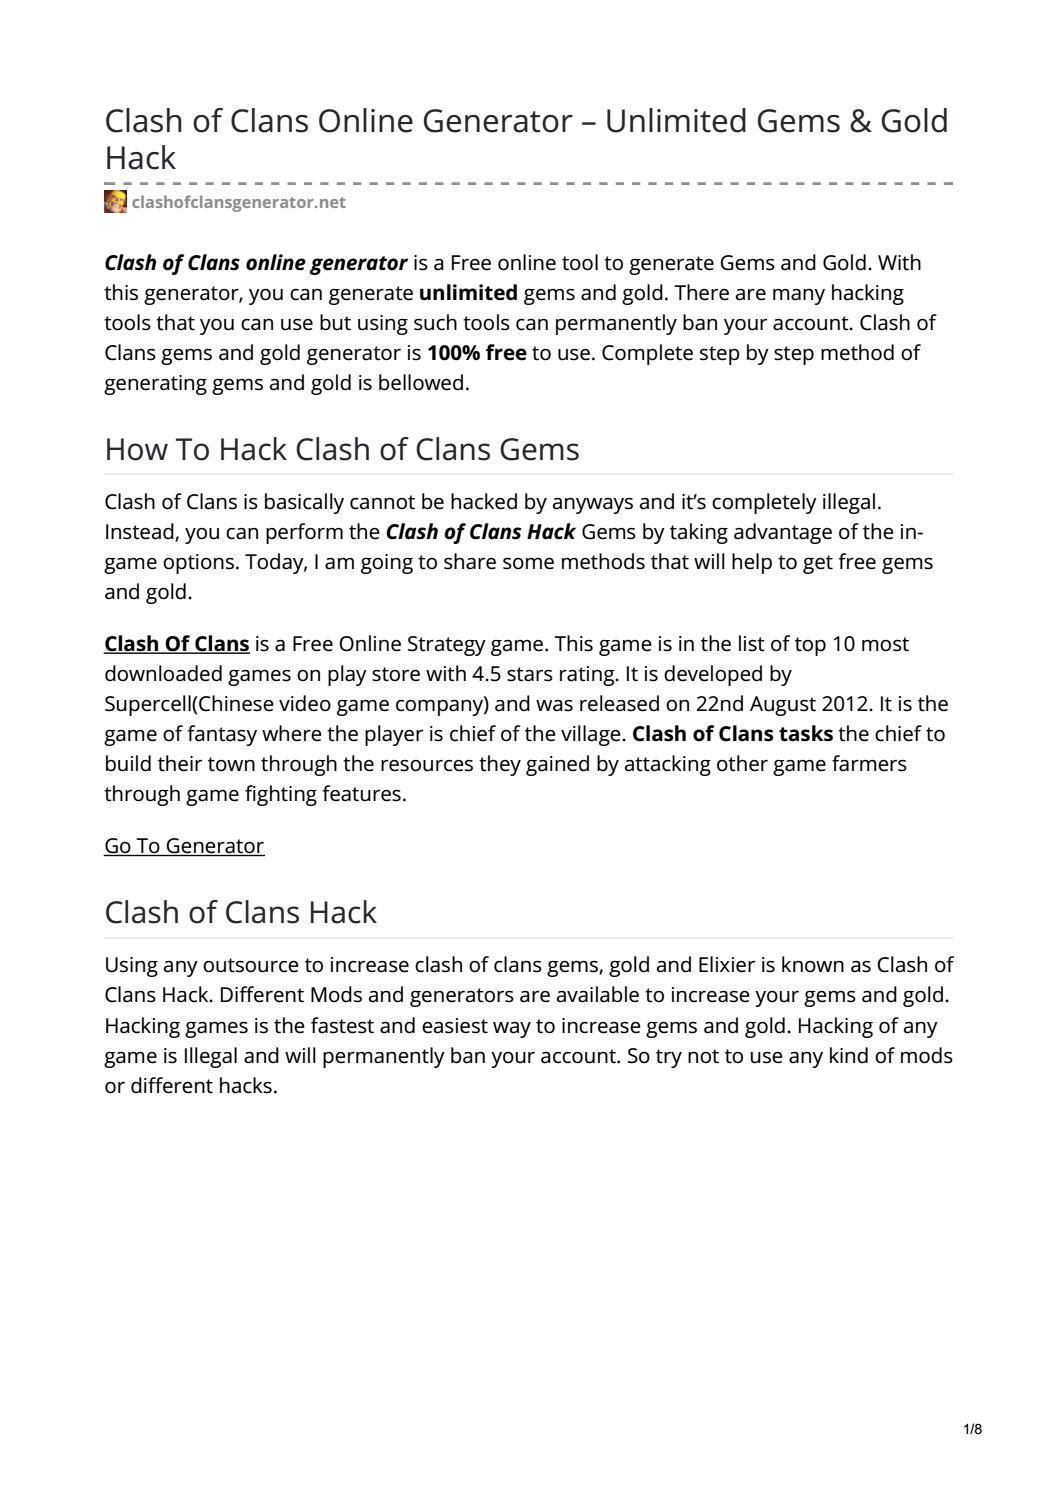 Clash Of Clans Online Generator By Cocgenerator Issuu